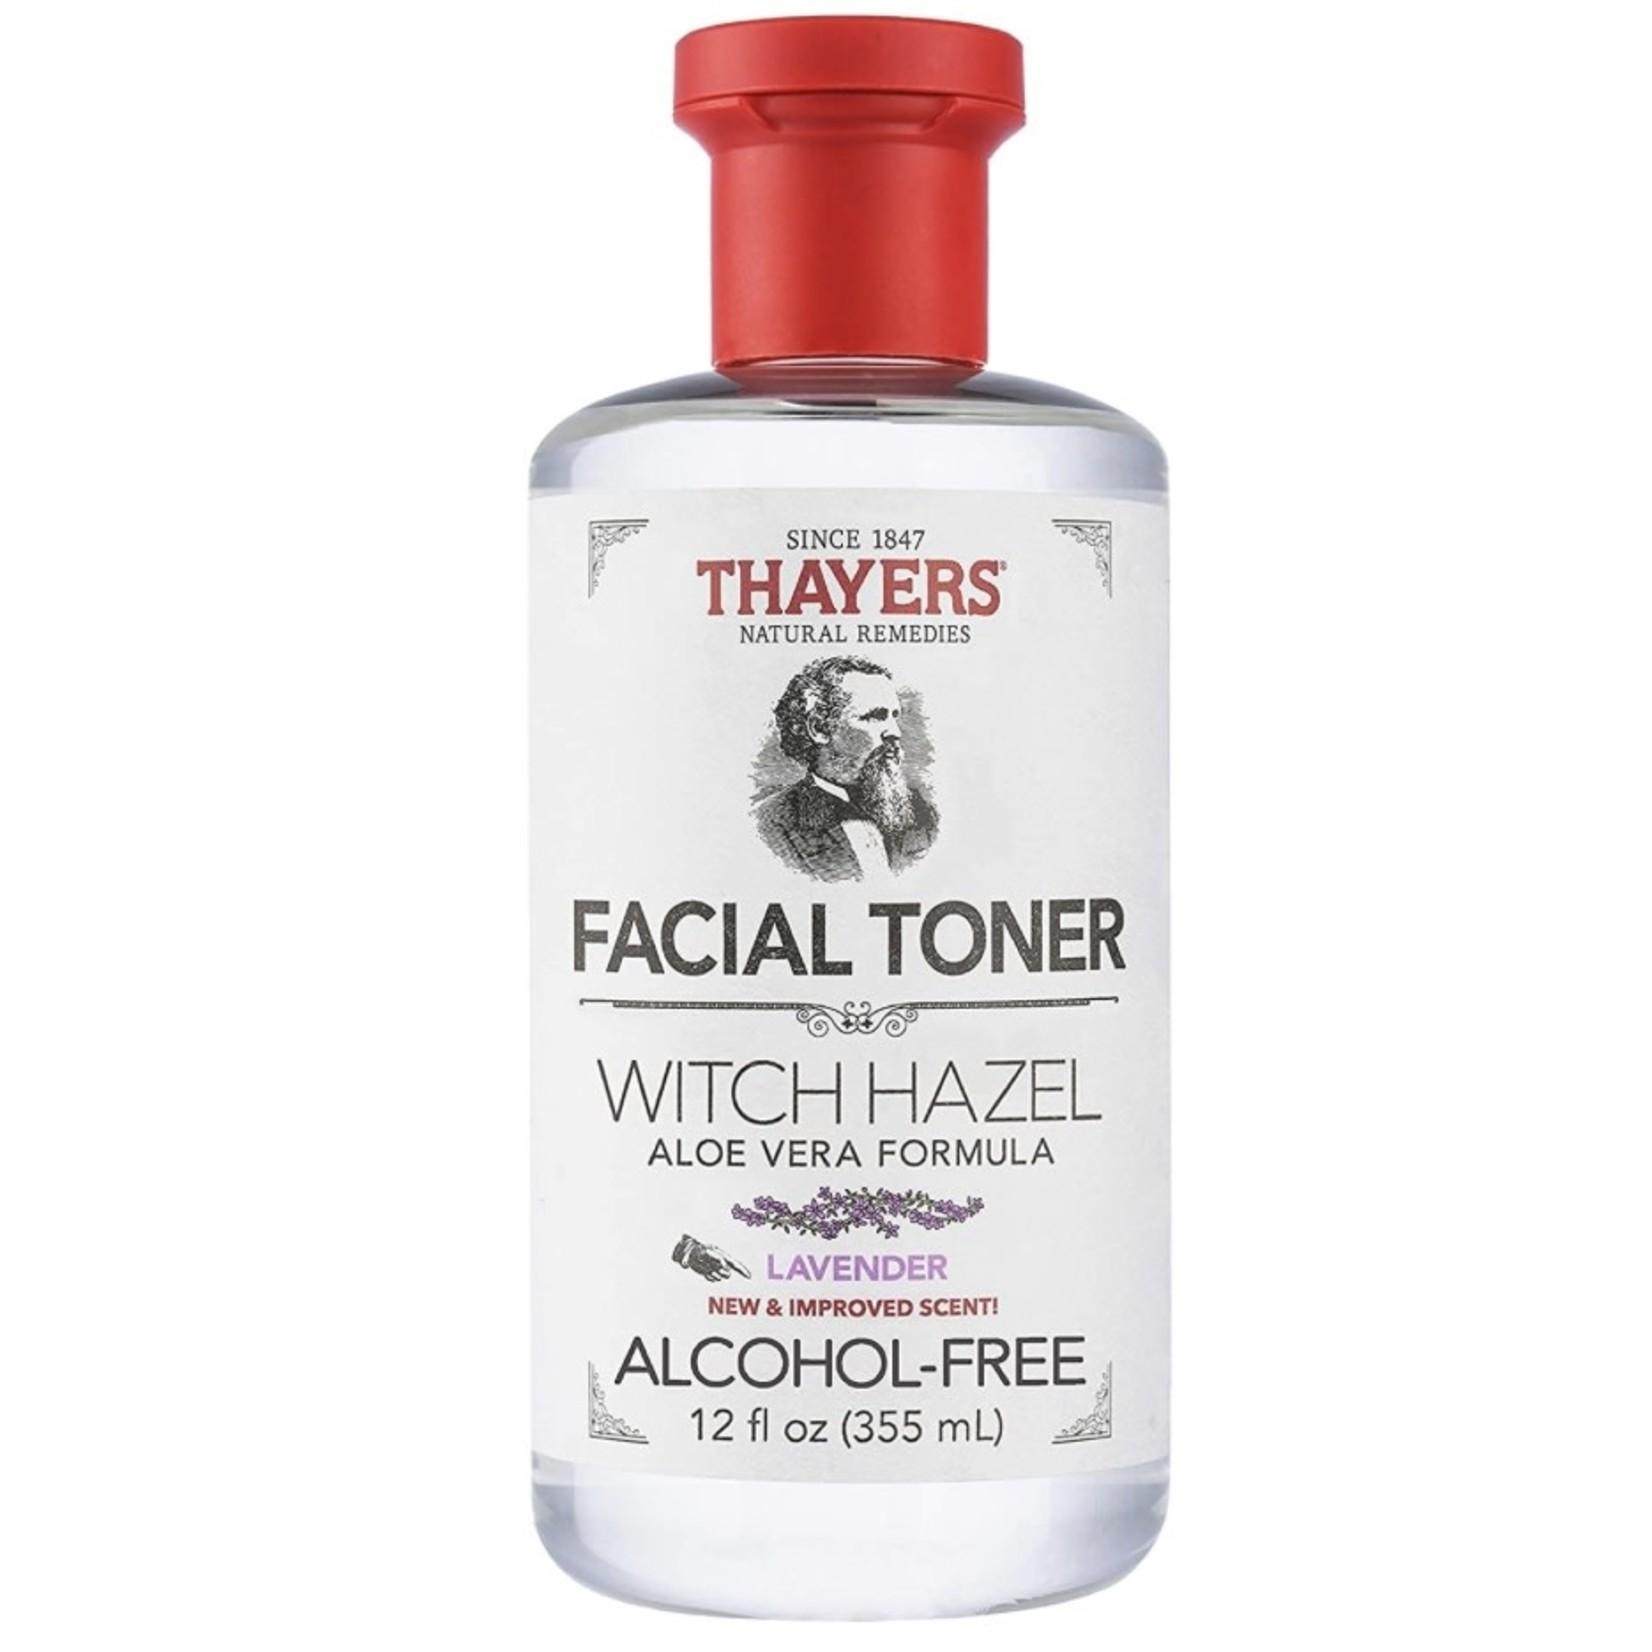 Thayers Thayers Witch Hazel Lavender Facial Toner 355ml